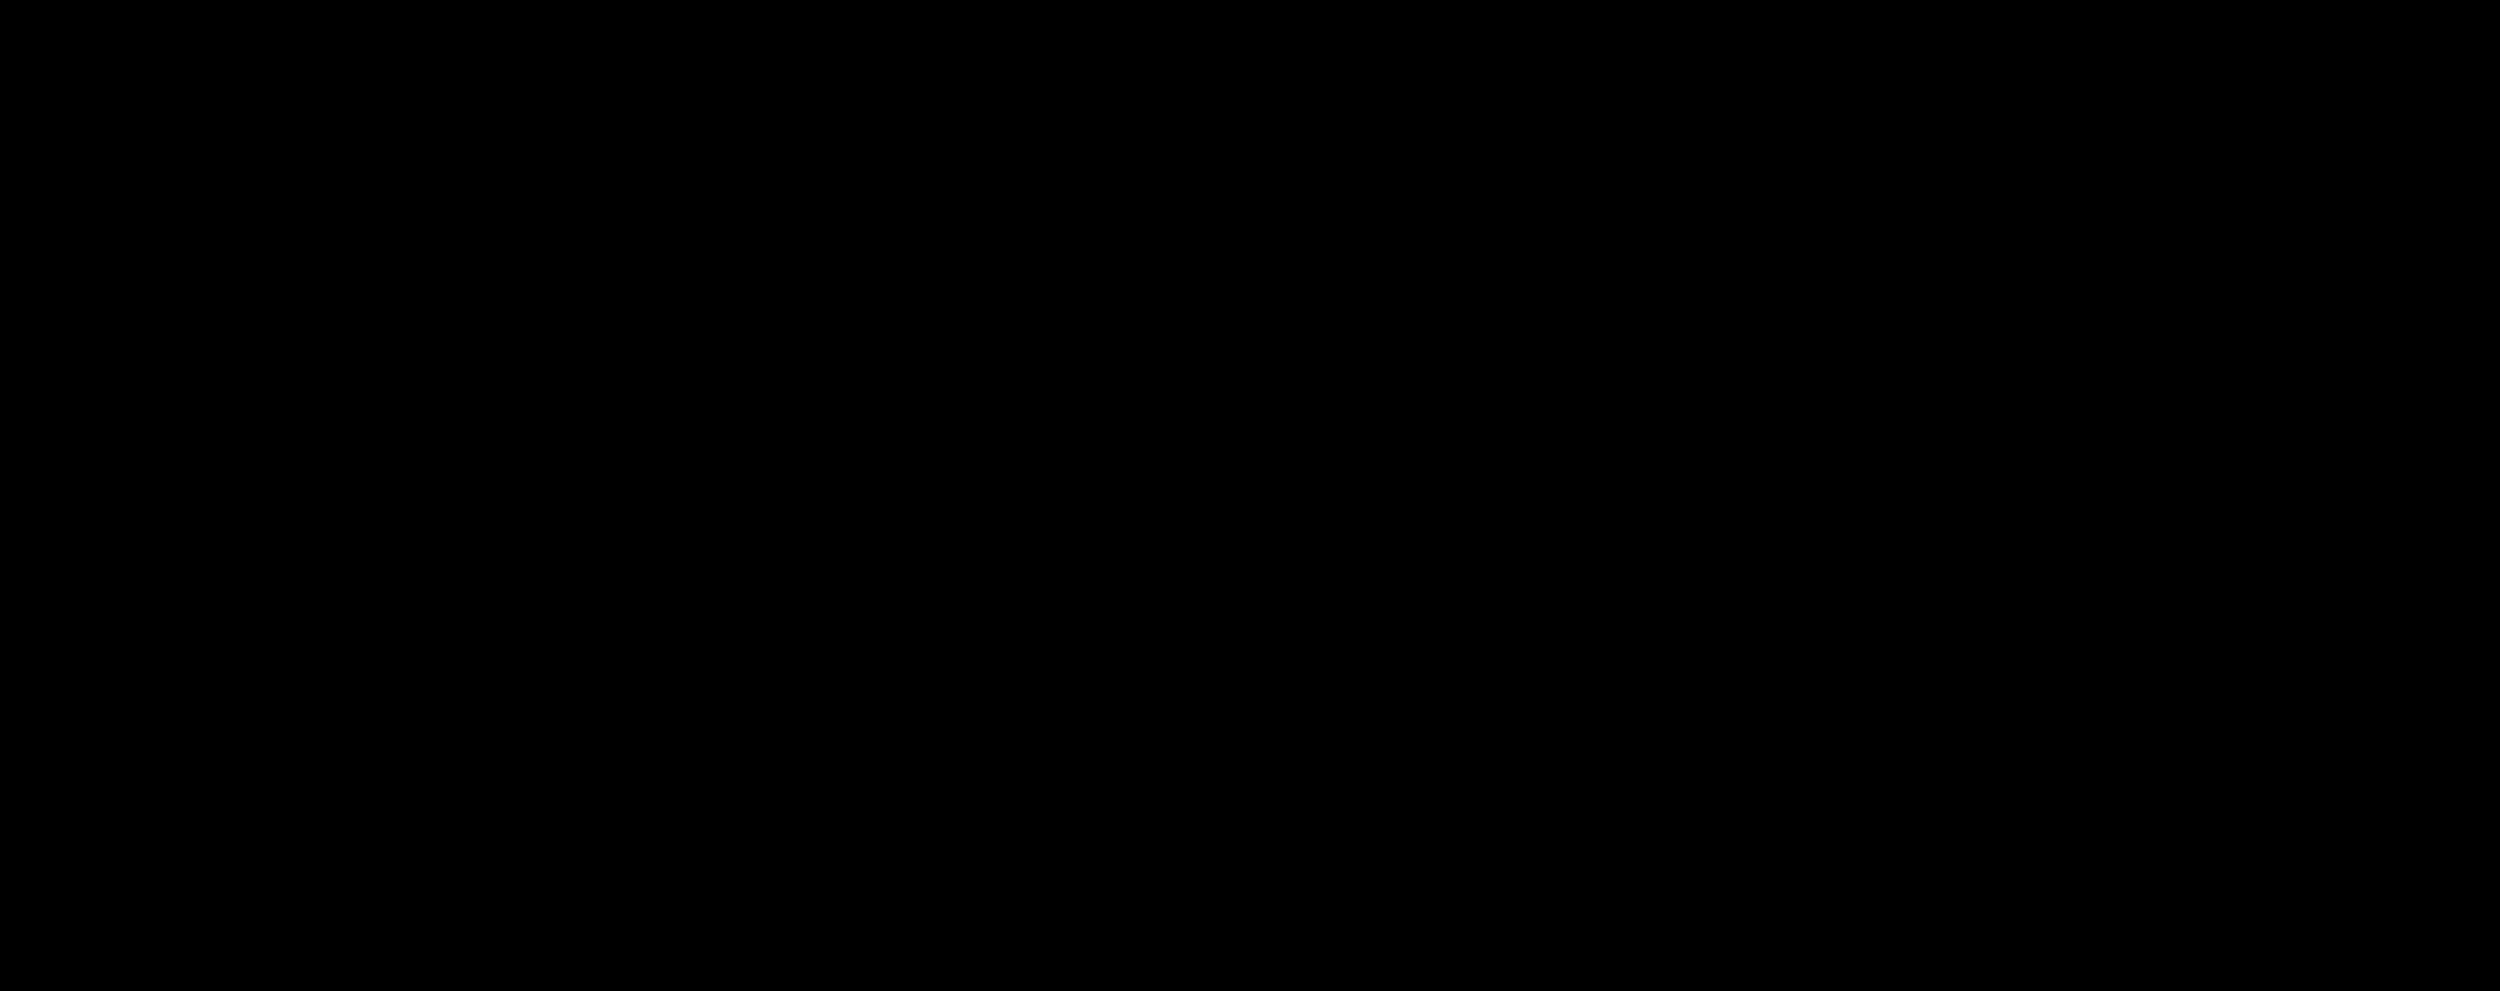 dark_logo+wordmark_transparent@2x.png